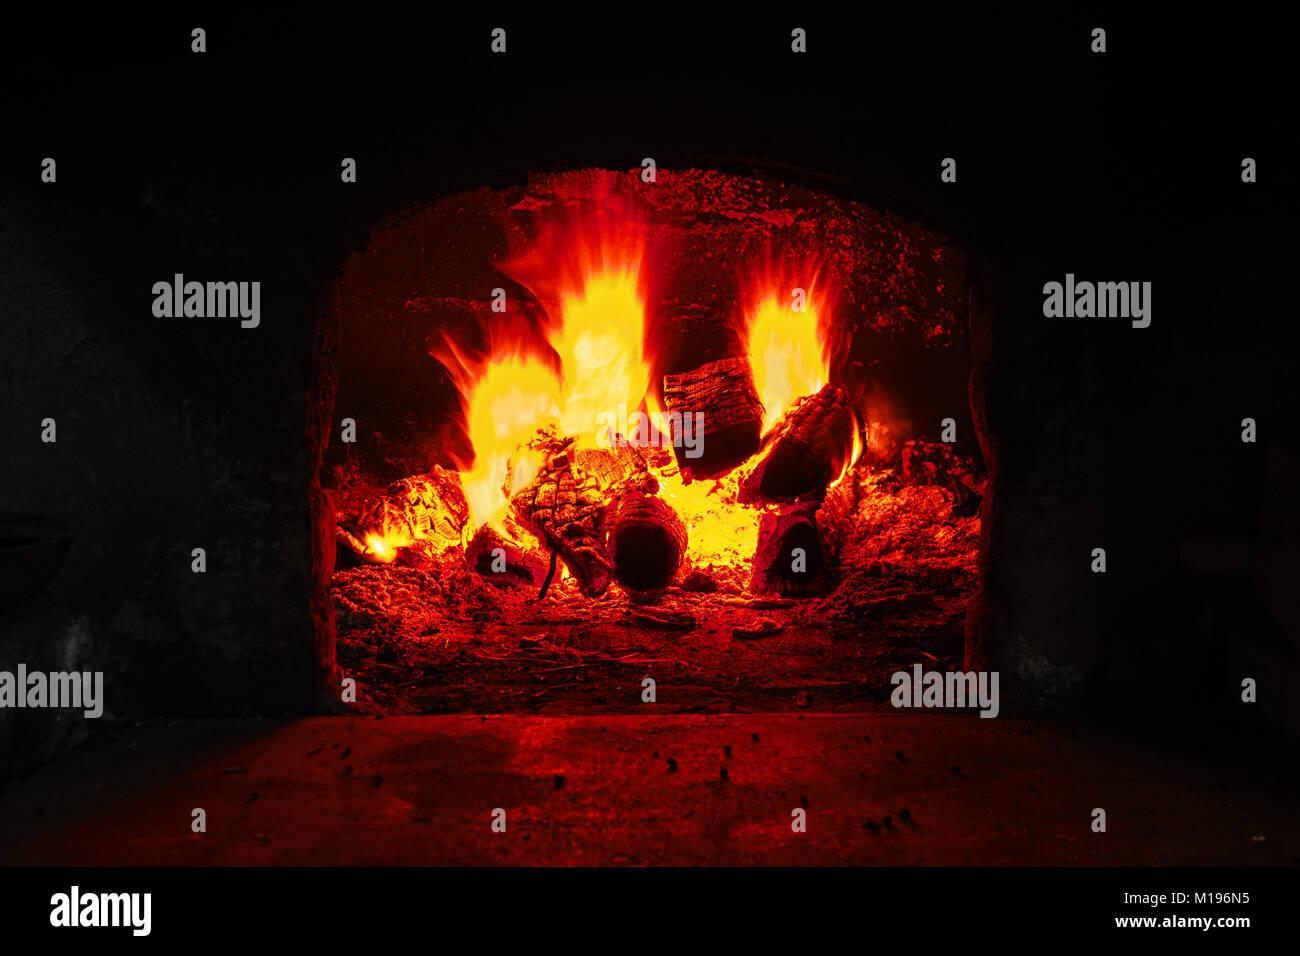 stove fireplace brick heat stockfotos stove fireplace brick heat bilder alamy. Black Bedroom Furniture Sets. Home Design Ideas